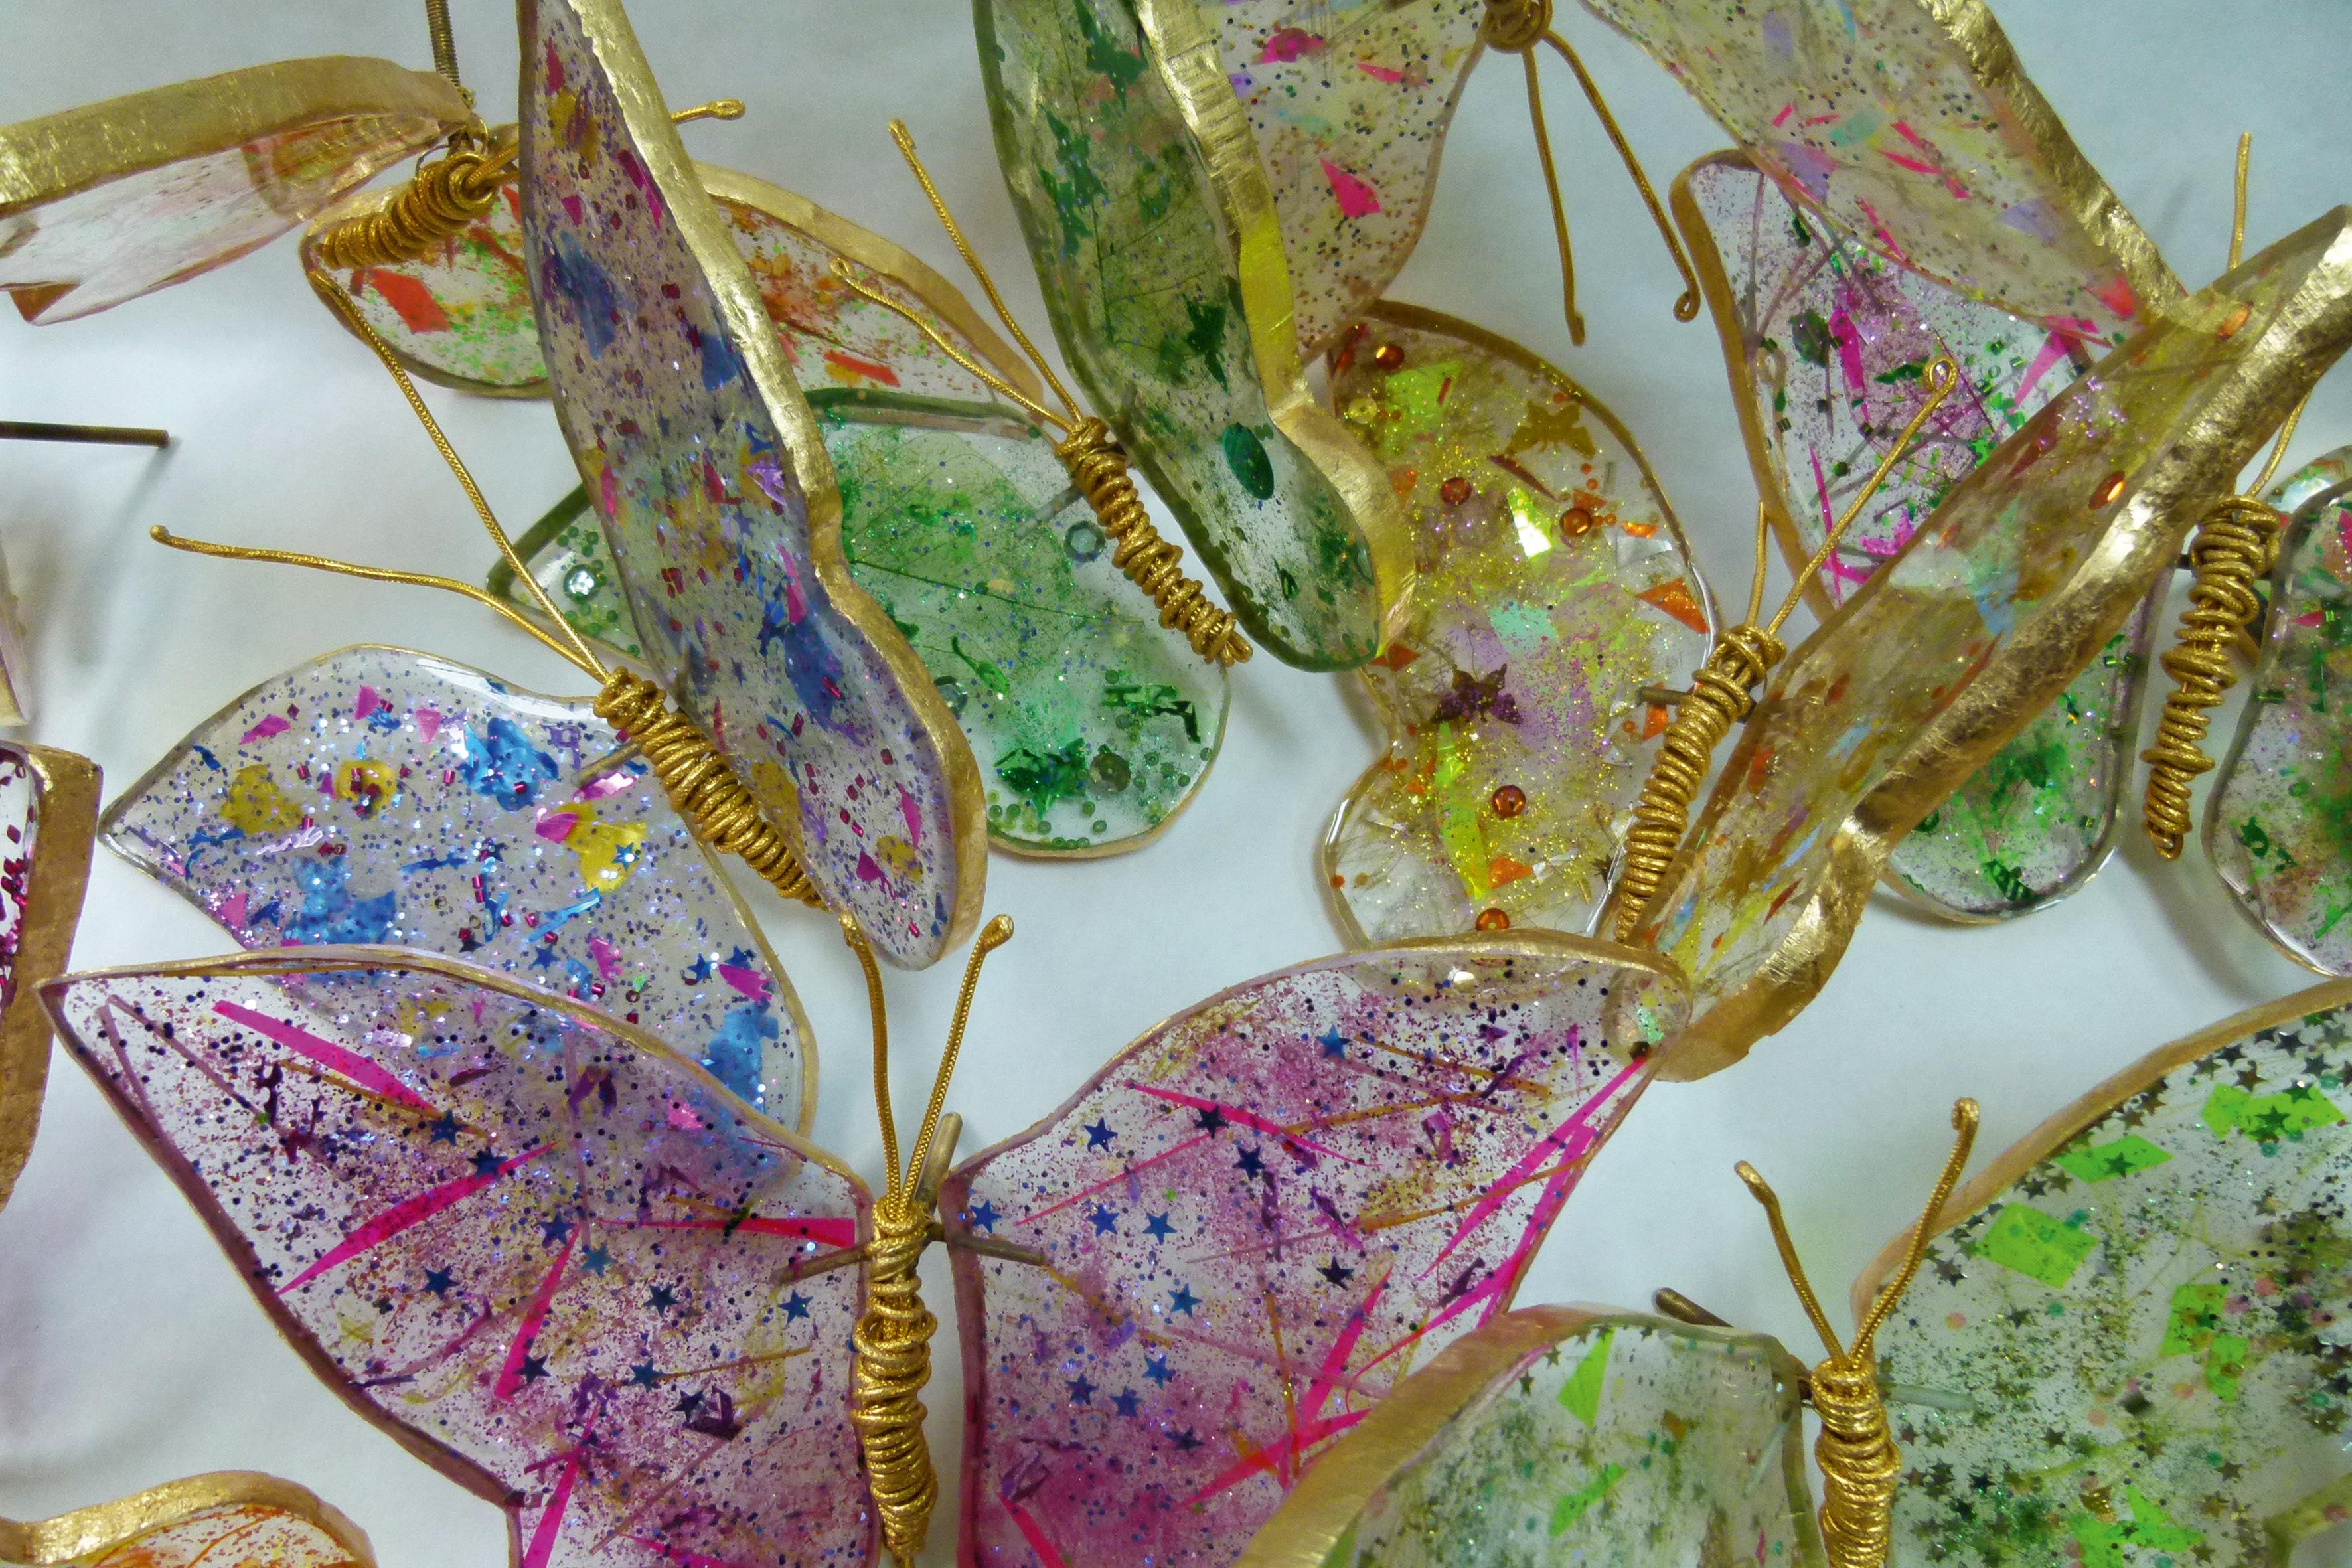 PApillons Schiaparelli